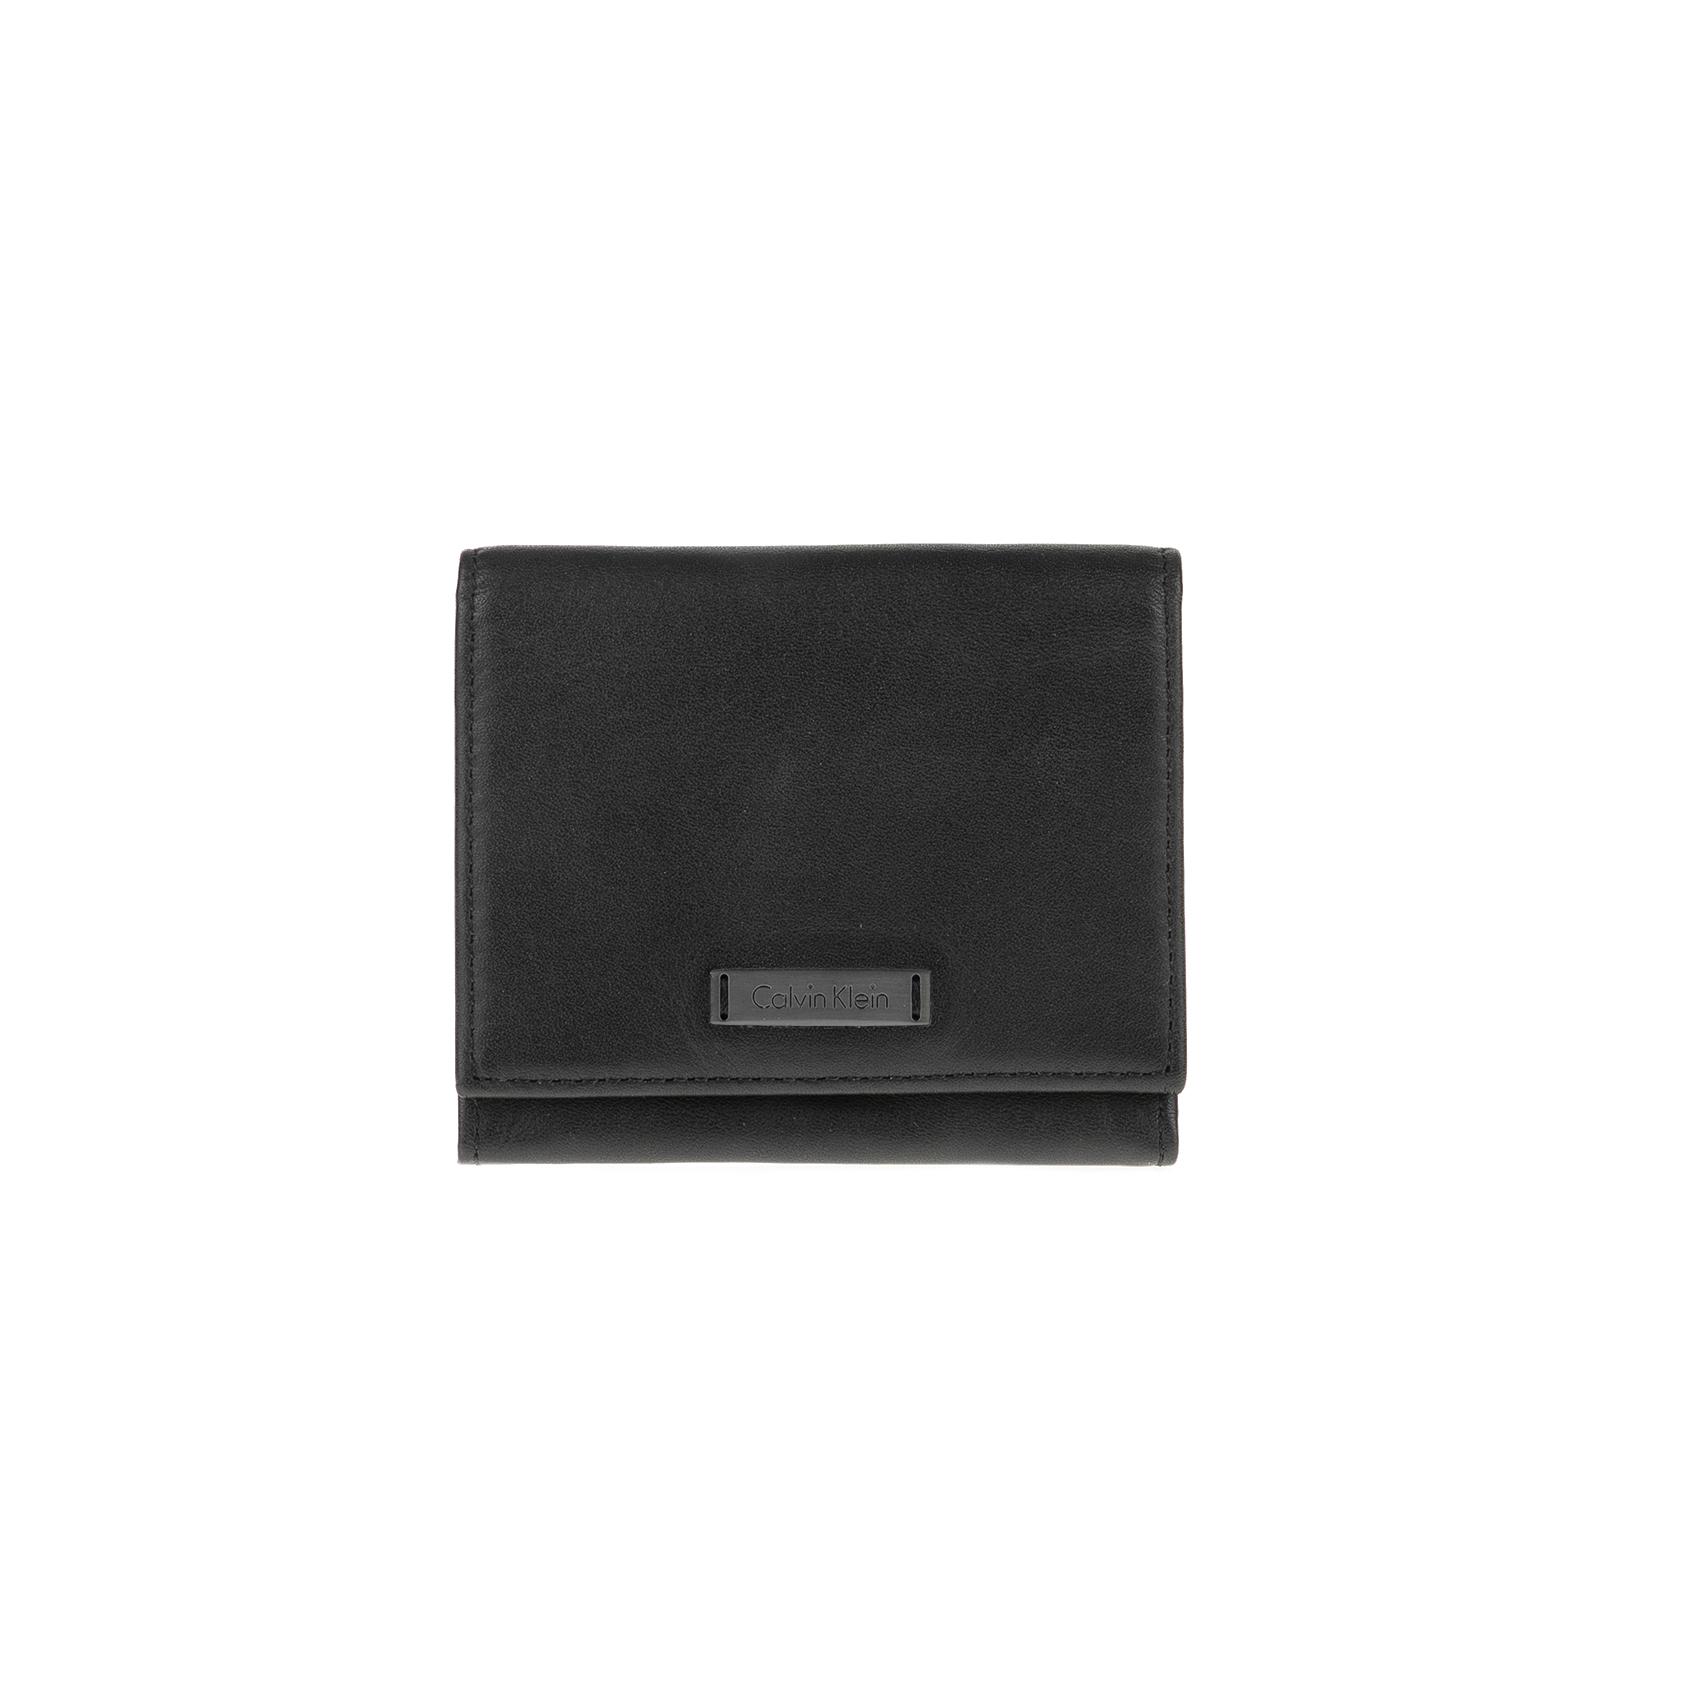 CALVIN KLEIN JEANS – Θήκη καρτών Calvin Klein Jeans μαύρη